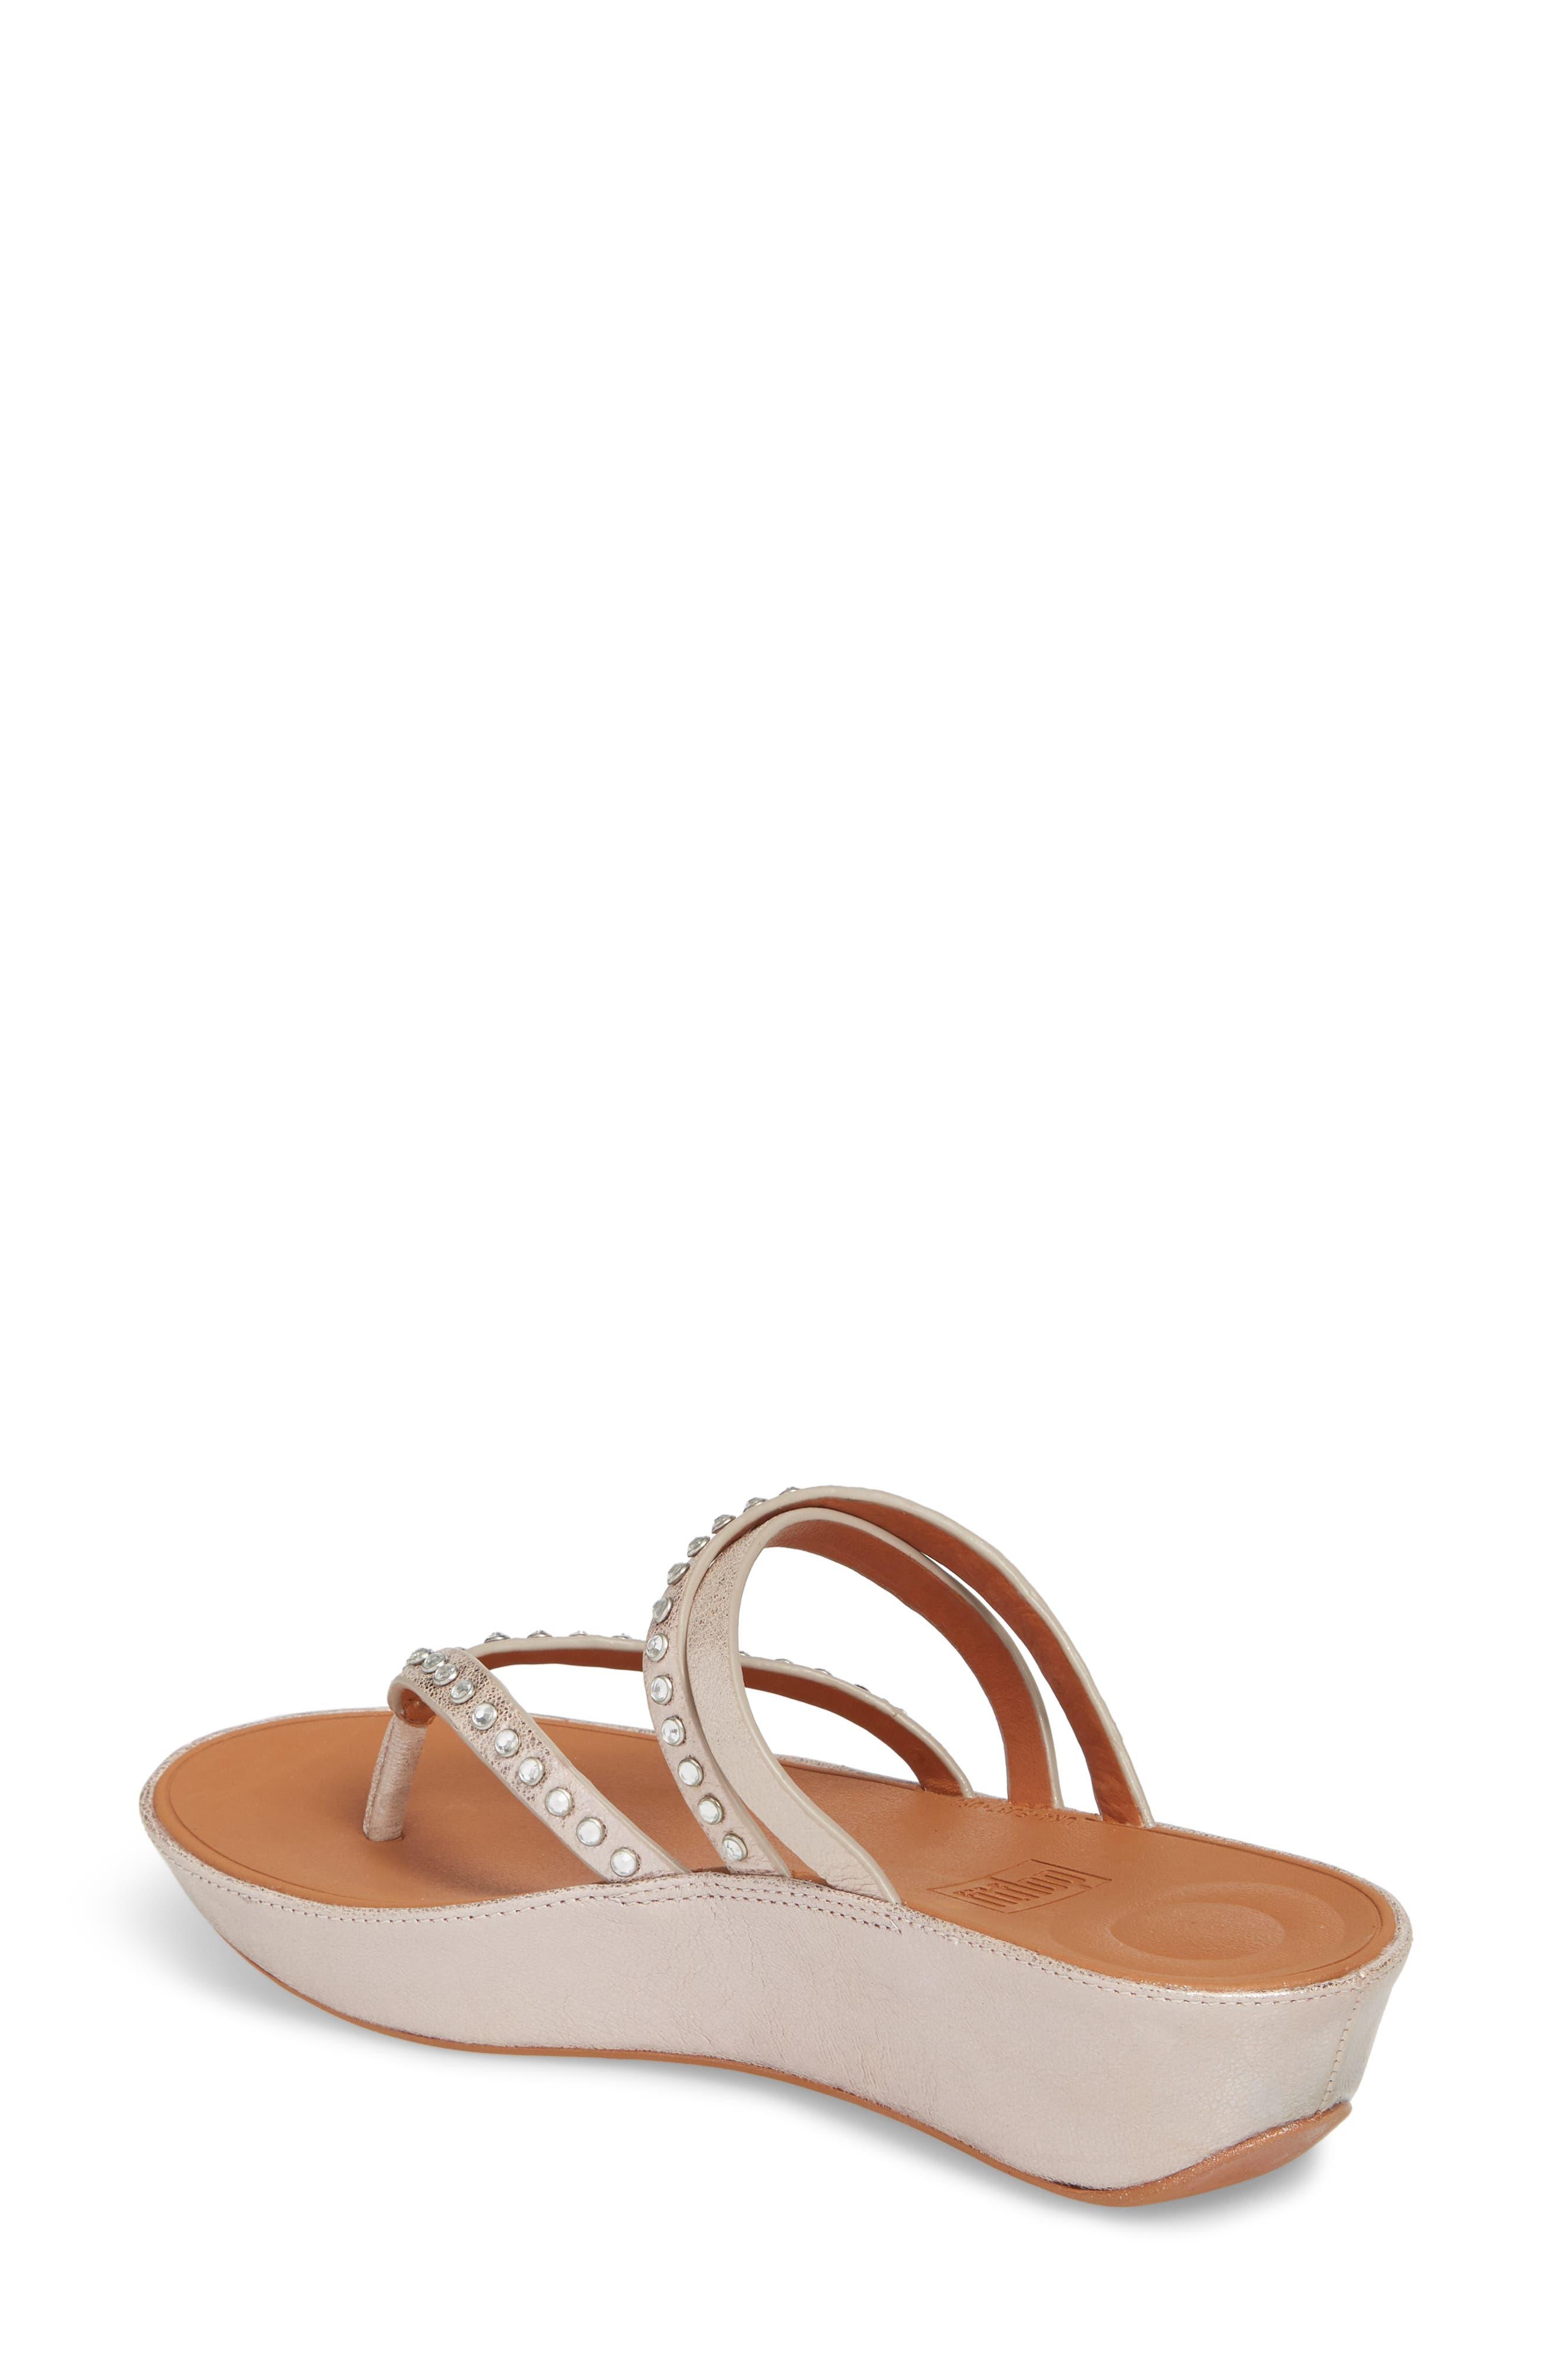 Linny Embellished Slide Sandal,                             Alternate thumbnail 2, color,                             Blush/ Metallic Nude Leather